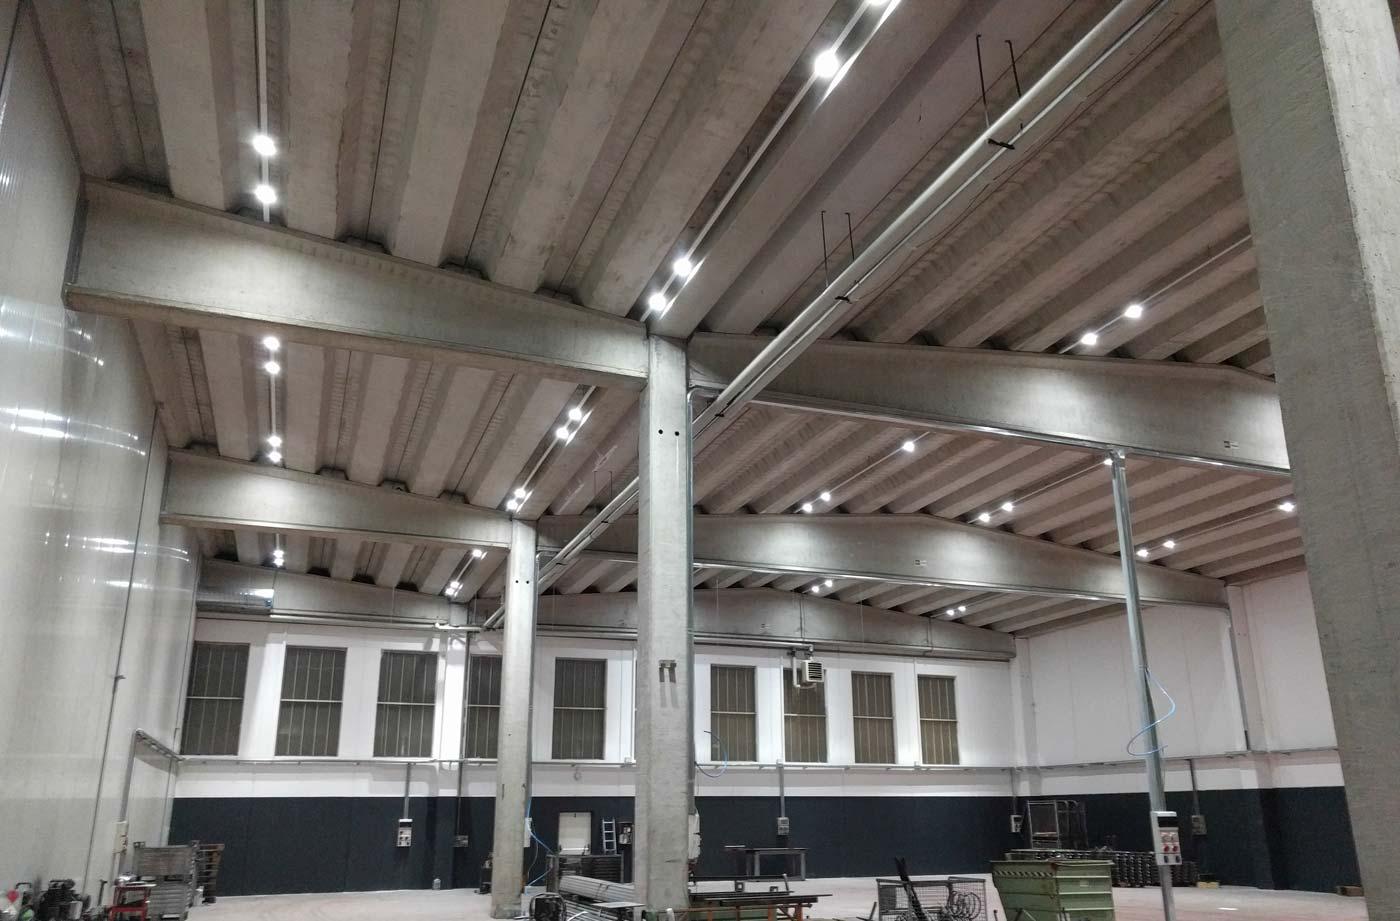 reLed - Ihr massgeschneiderte LED-Beleuchtung